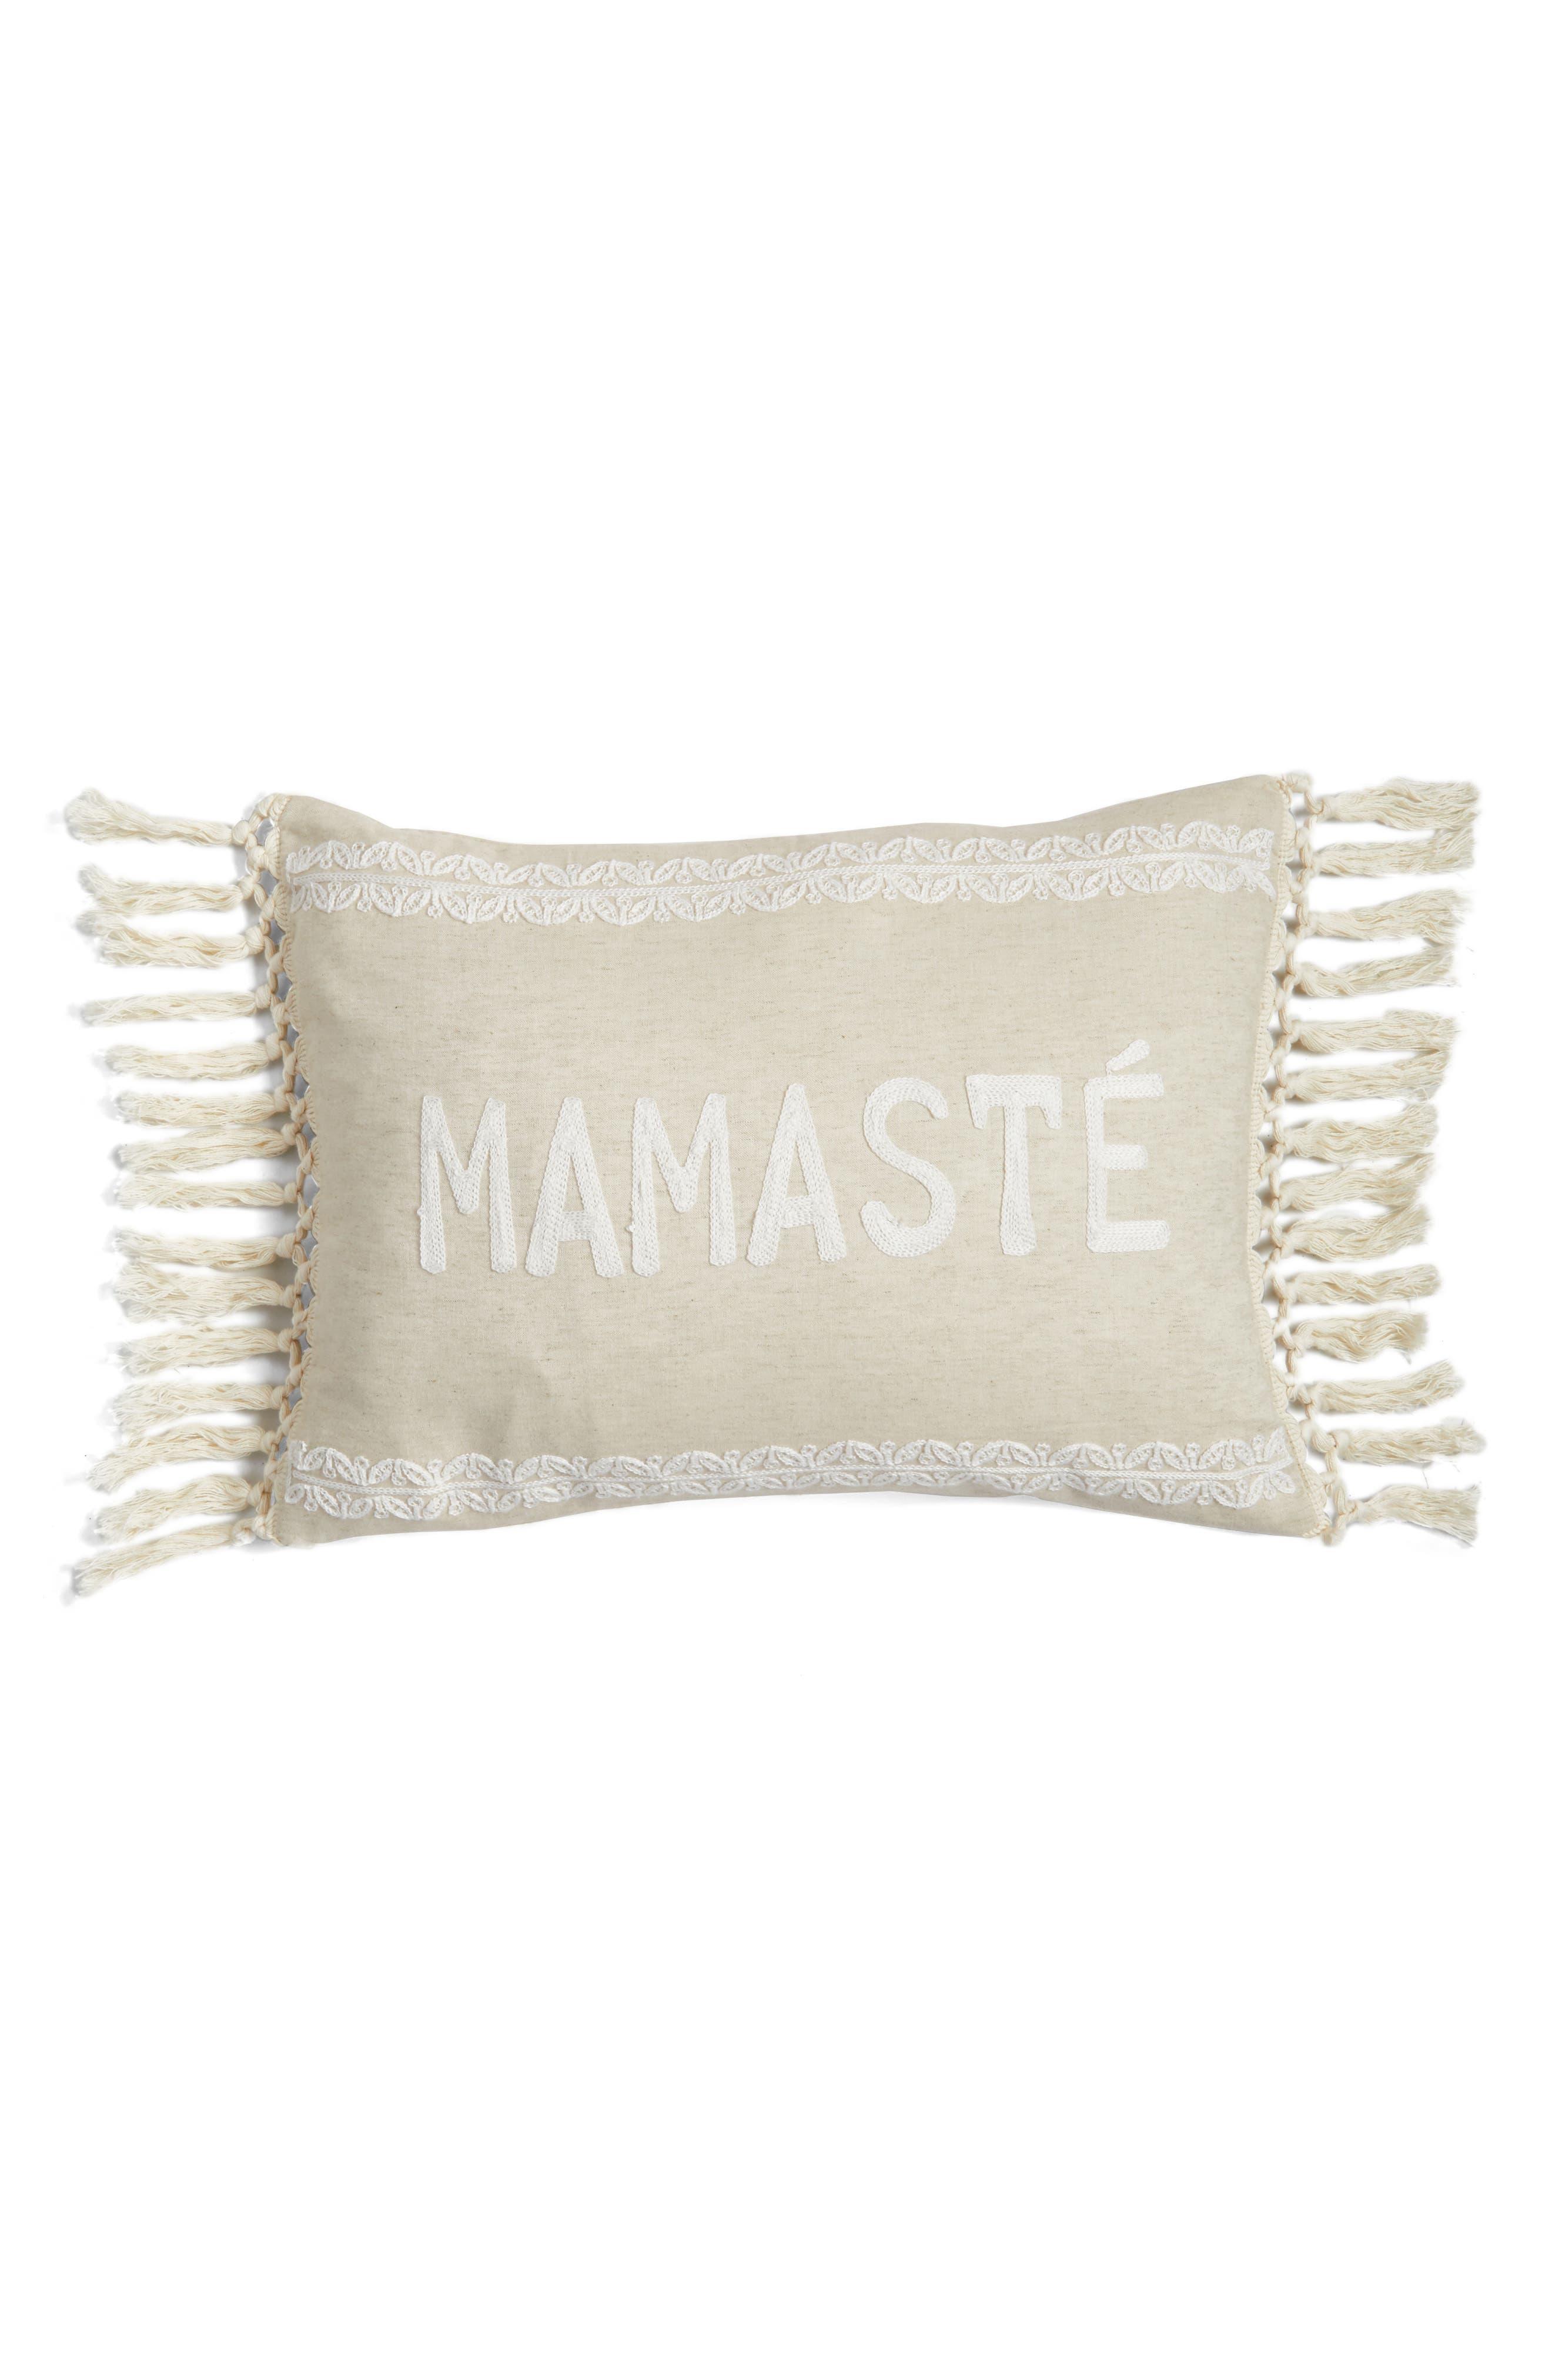 Mamaste Accent Pillow,                             Main thumbnail 1, color,                             250